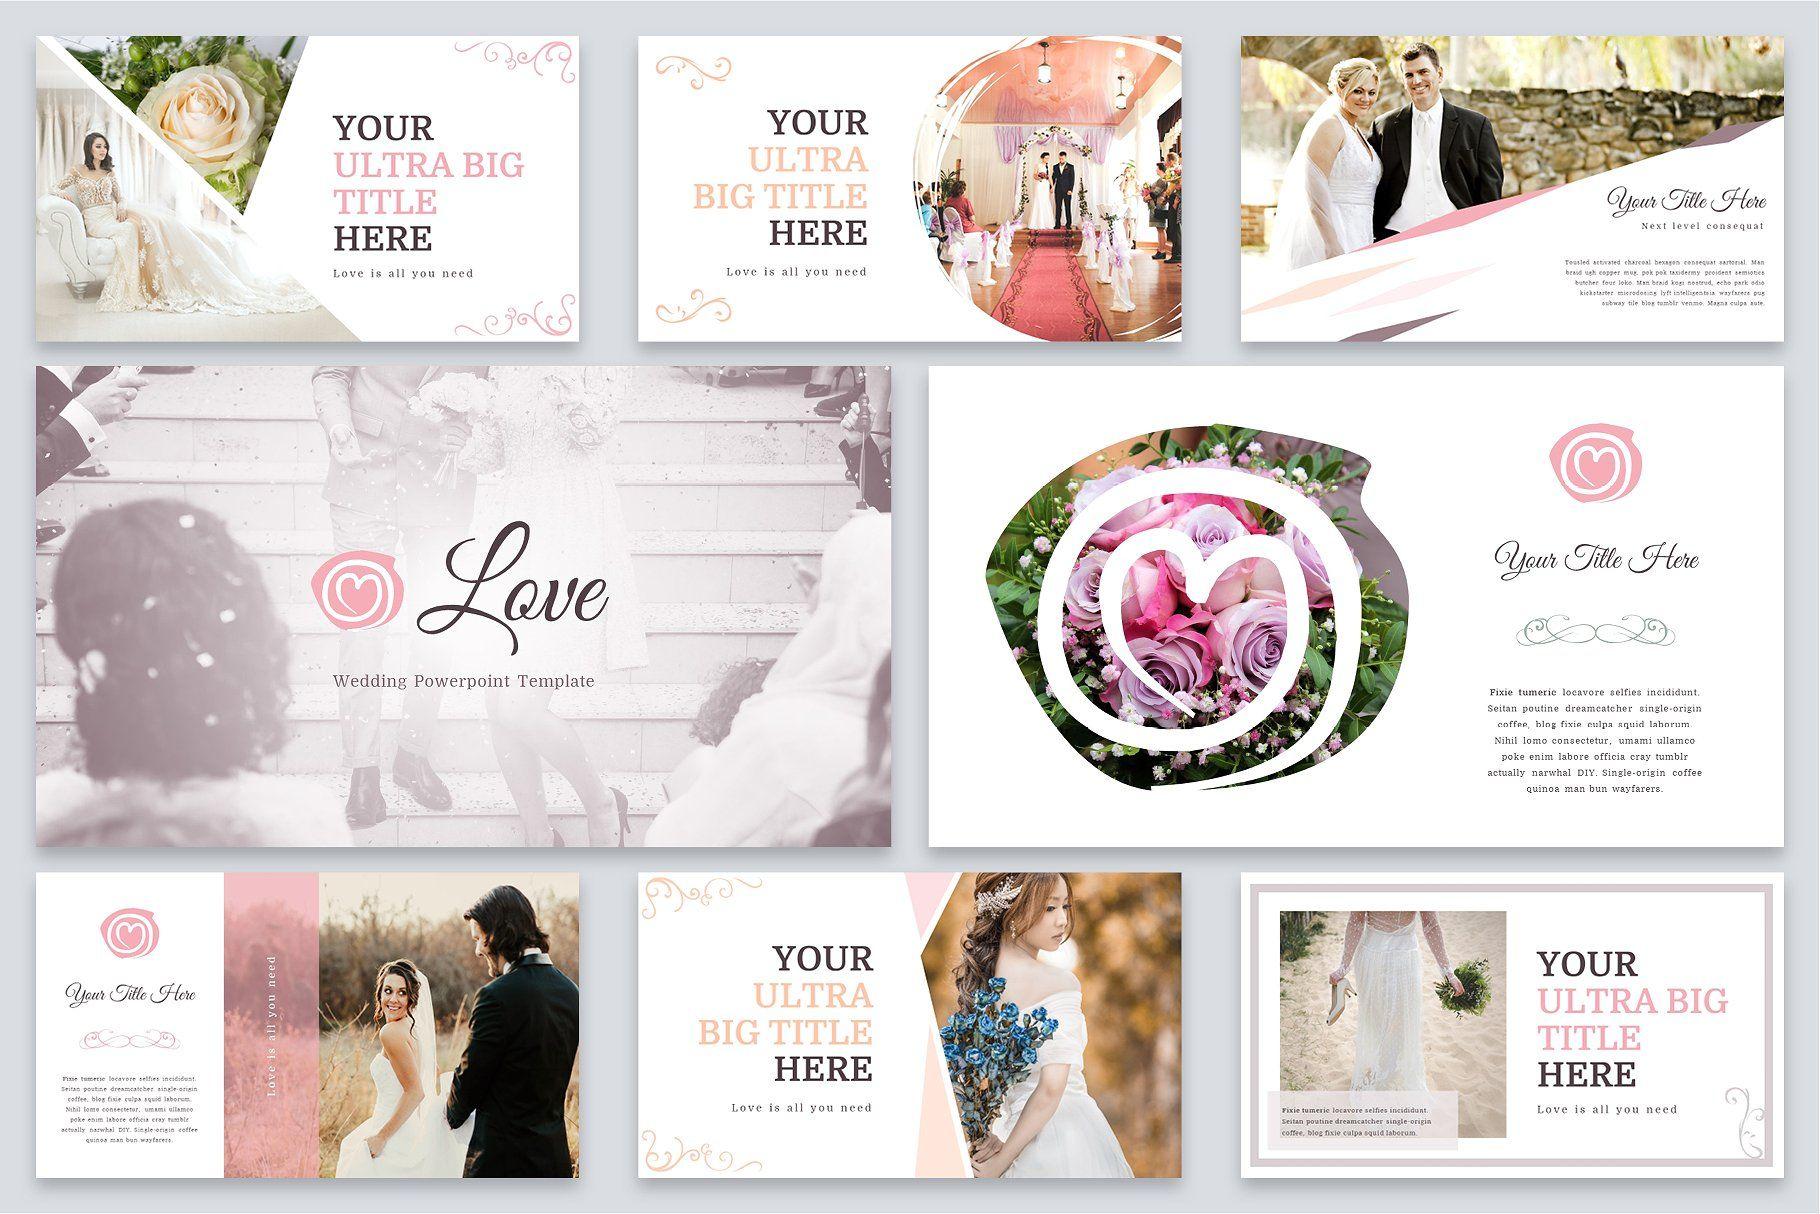 Love Wedding Powerpoint Template Powerpoint Templates